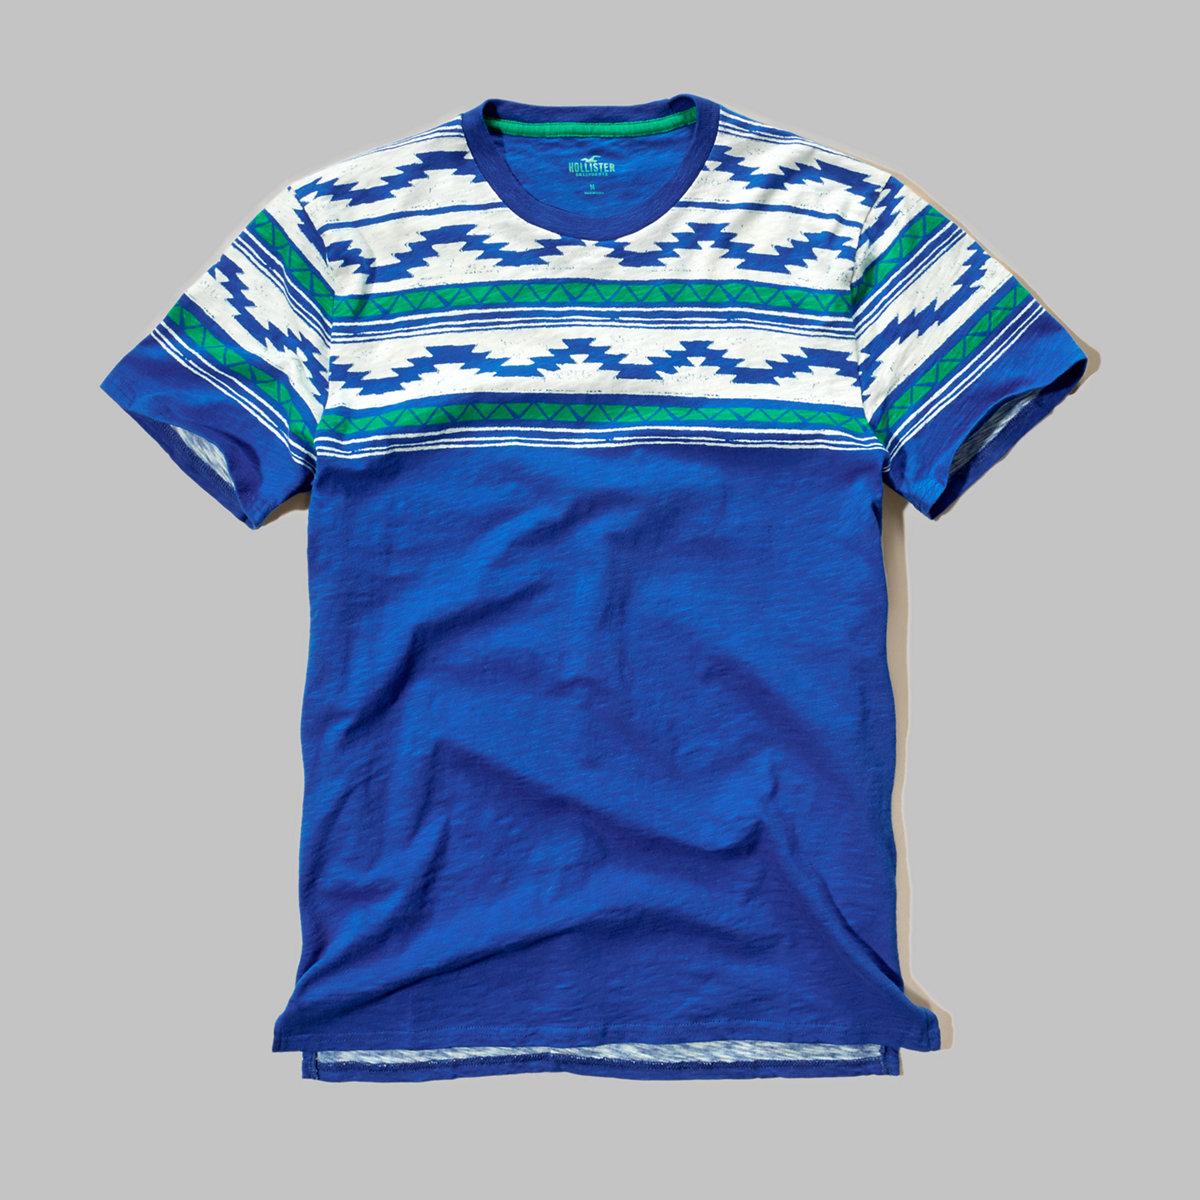 Contrast Print T-Shirt